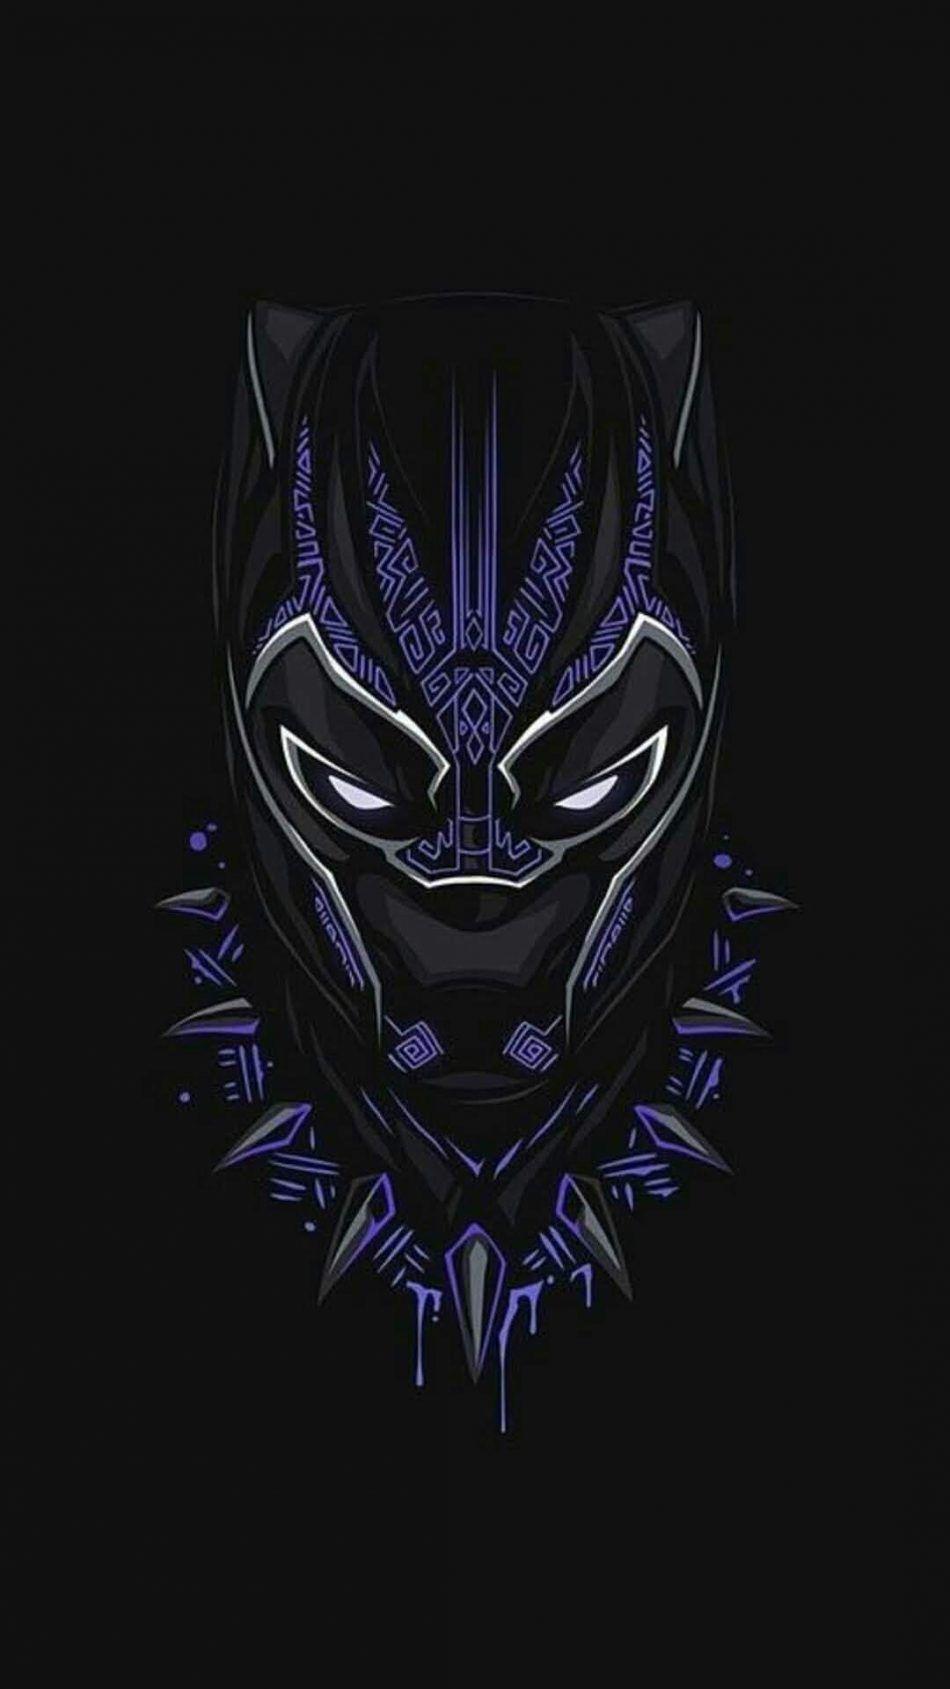 Black Panther Iphone Wallpaper Download Black Panther Hd